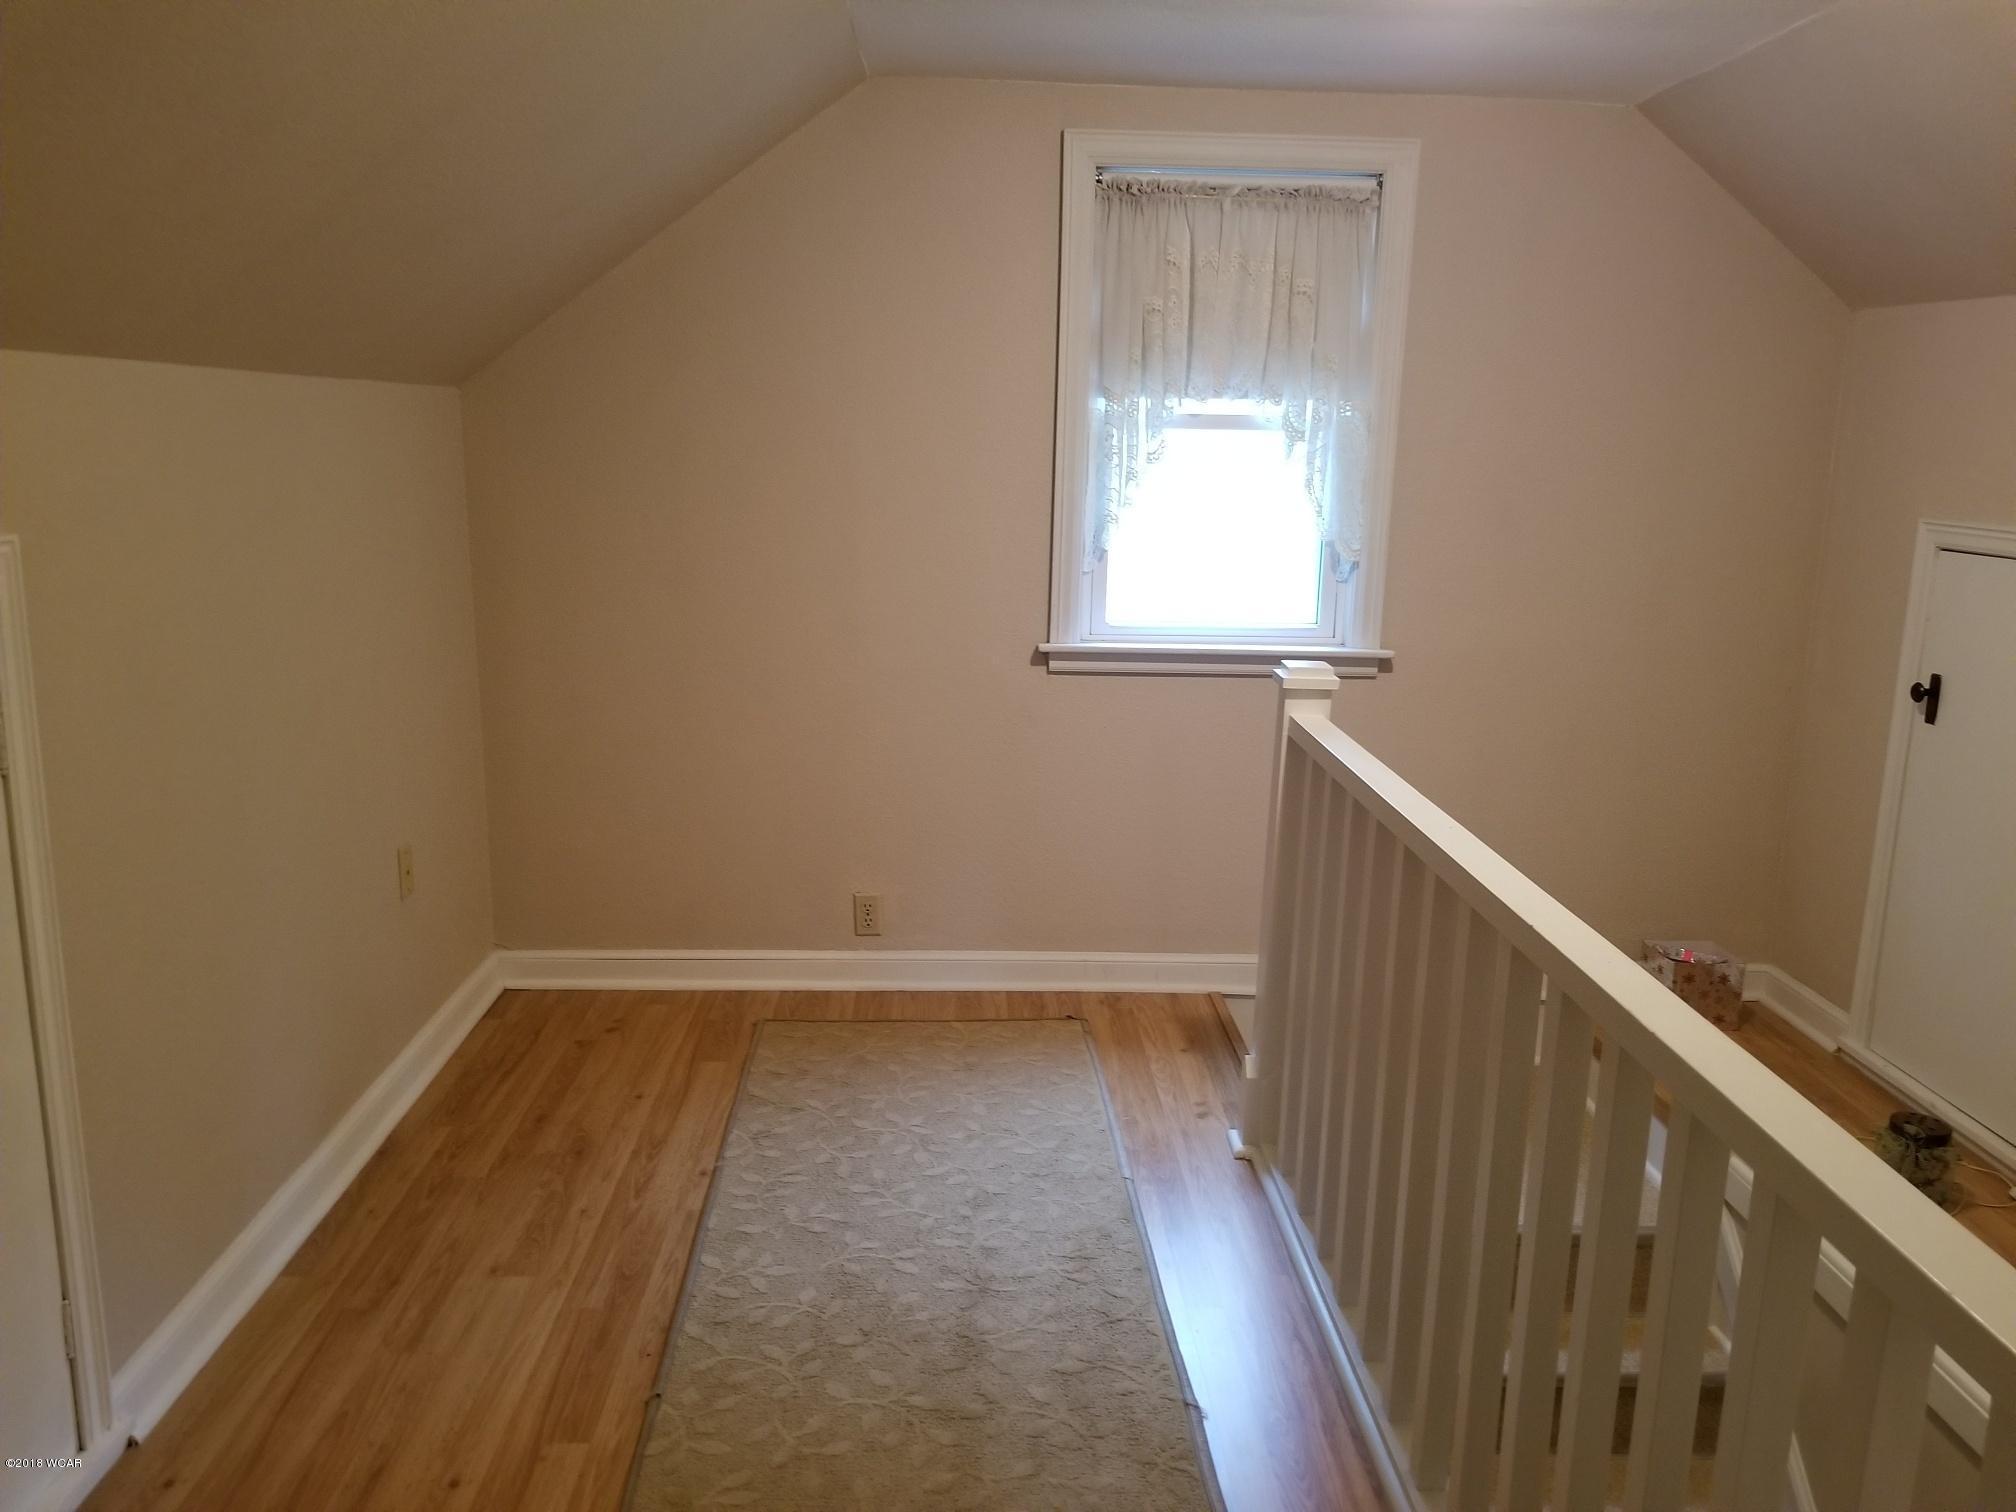 1116 SW 4th Street,Willmar,3 Bedrooms Bedrooms,2 BathroomsBathrooms,Single Family,SW 4th Street,6032571